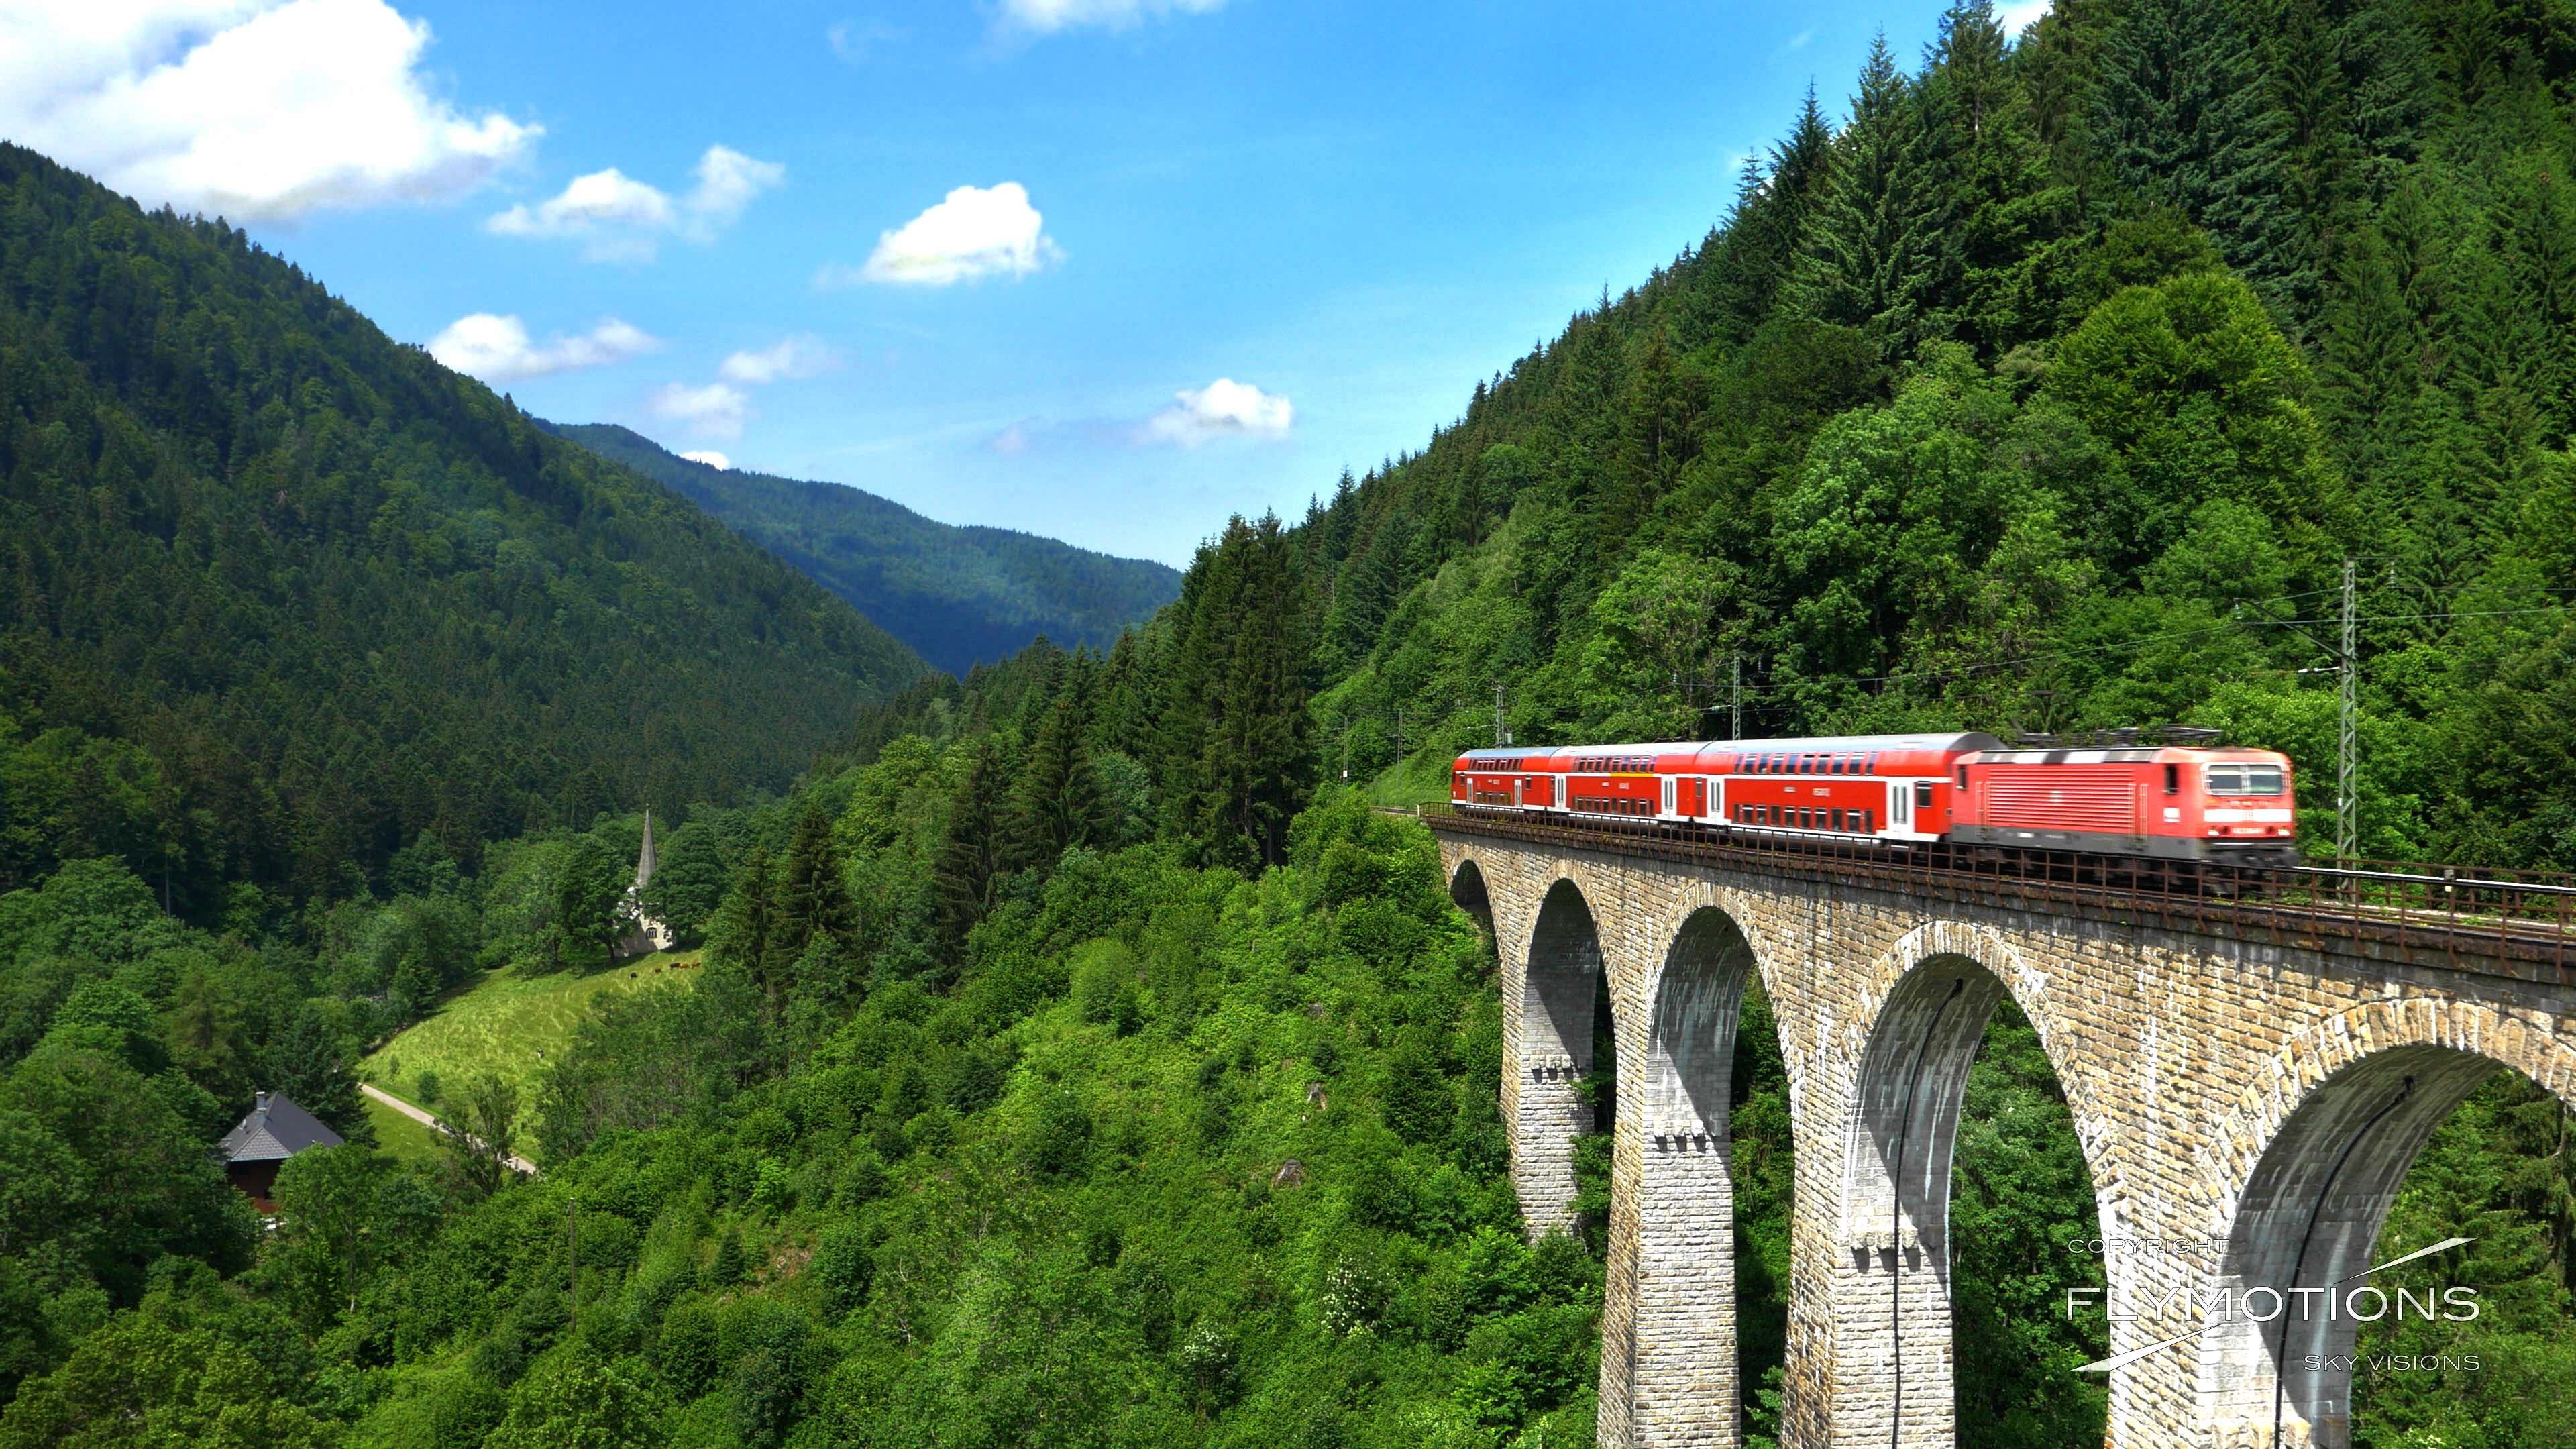 Höllentalbahn Höllental Schwarzwald Eisenbahnbruecke Ravennabrücke Kirche Luftaufnahme